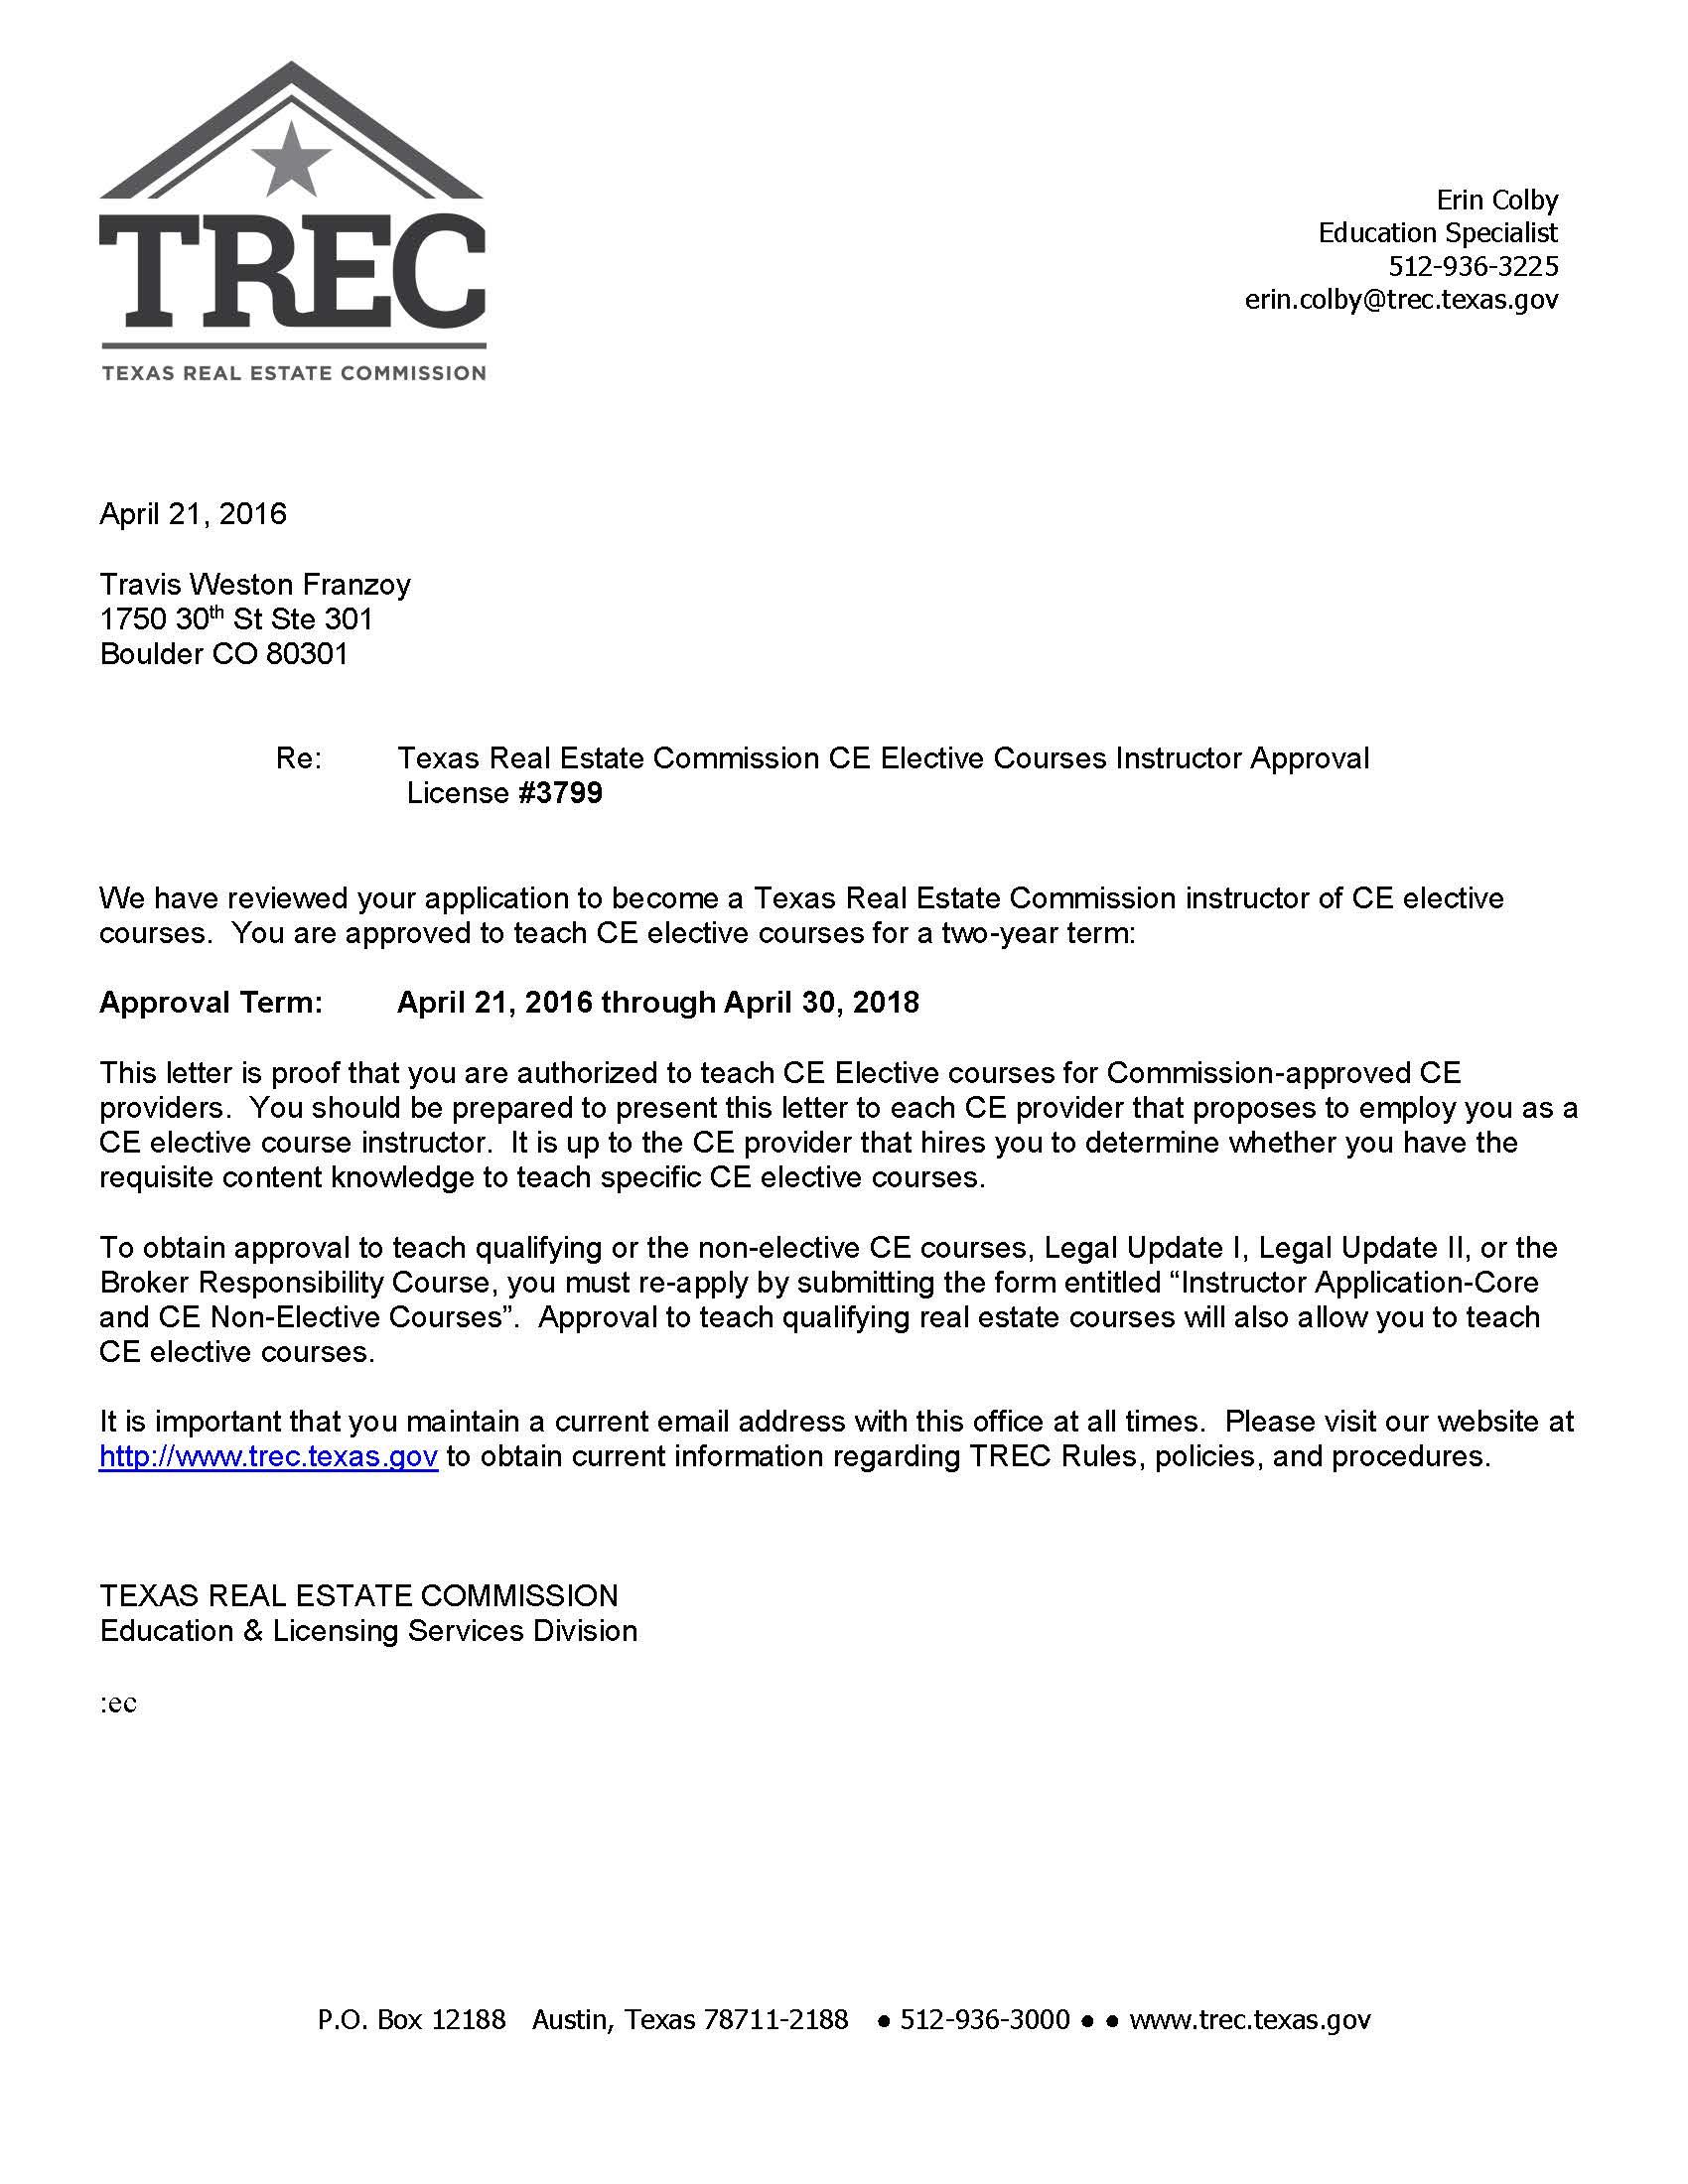 oklahoma real estate commission